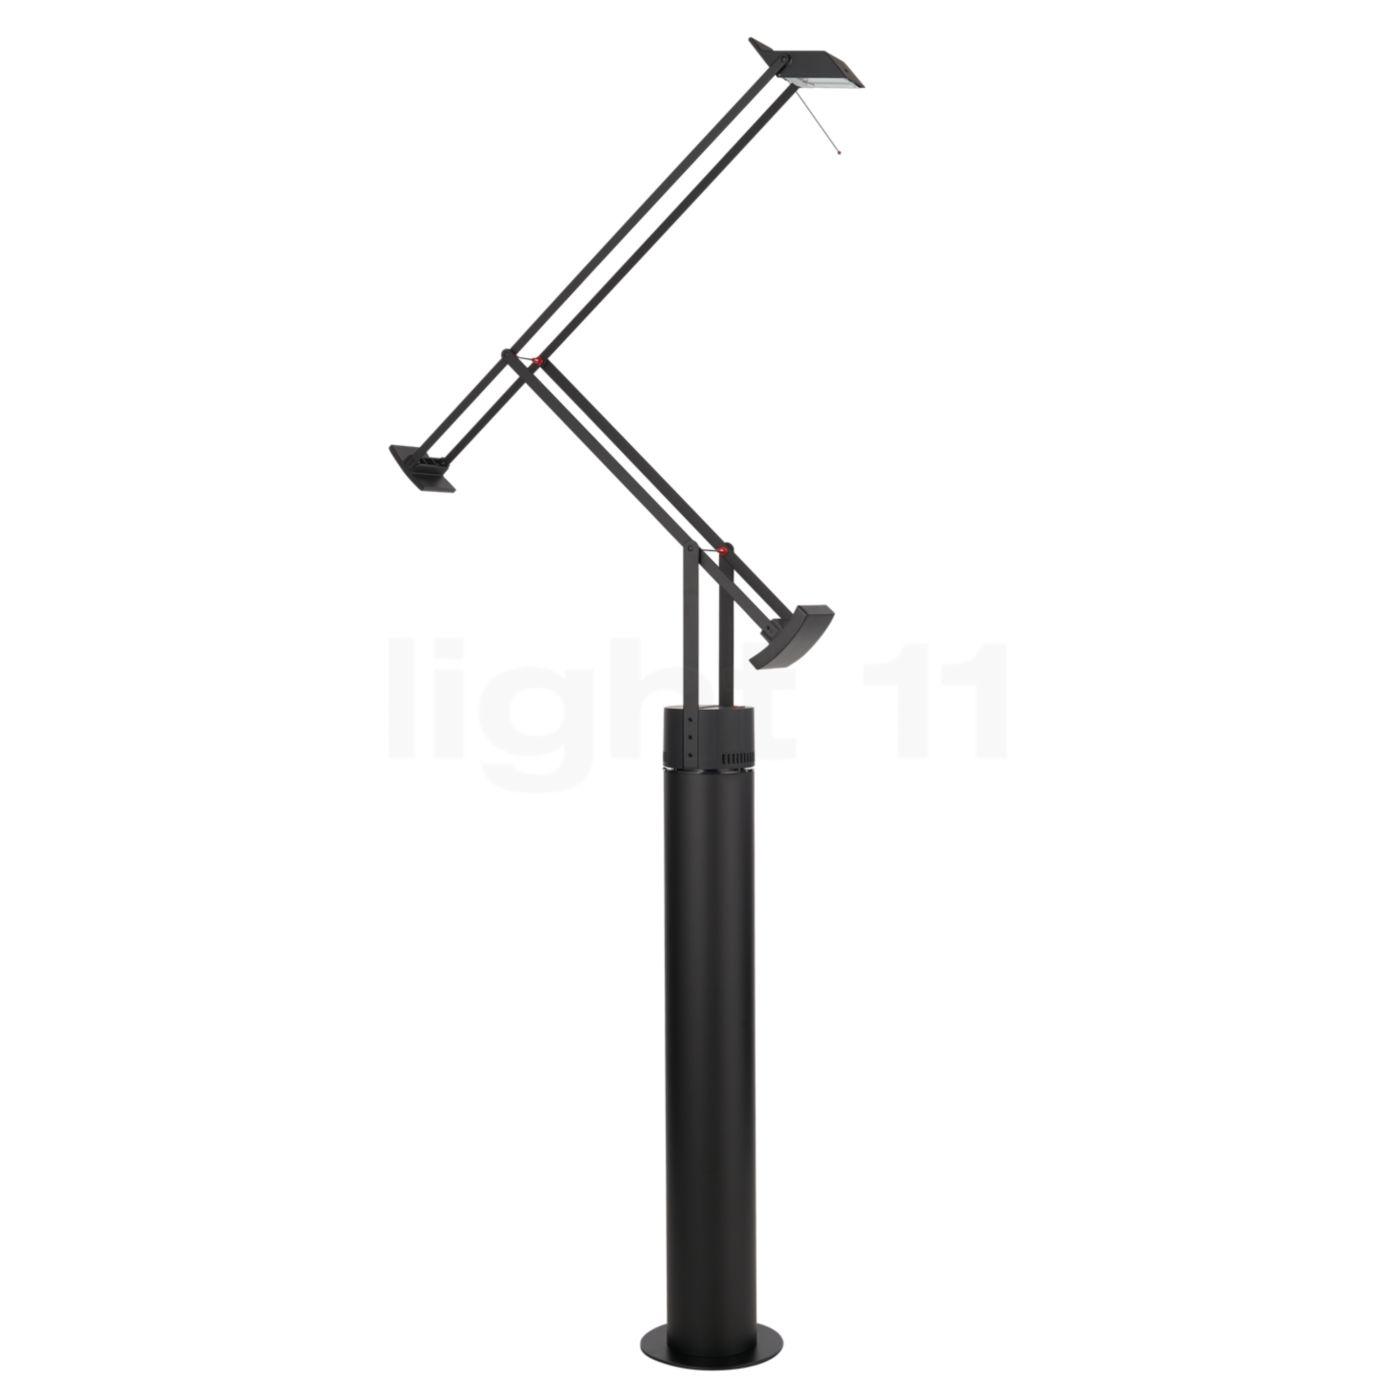 artemide tizio terra 50 lampadaire en vente sur. Black Bedroom Furniture Sets. Home Design Ideas